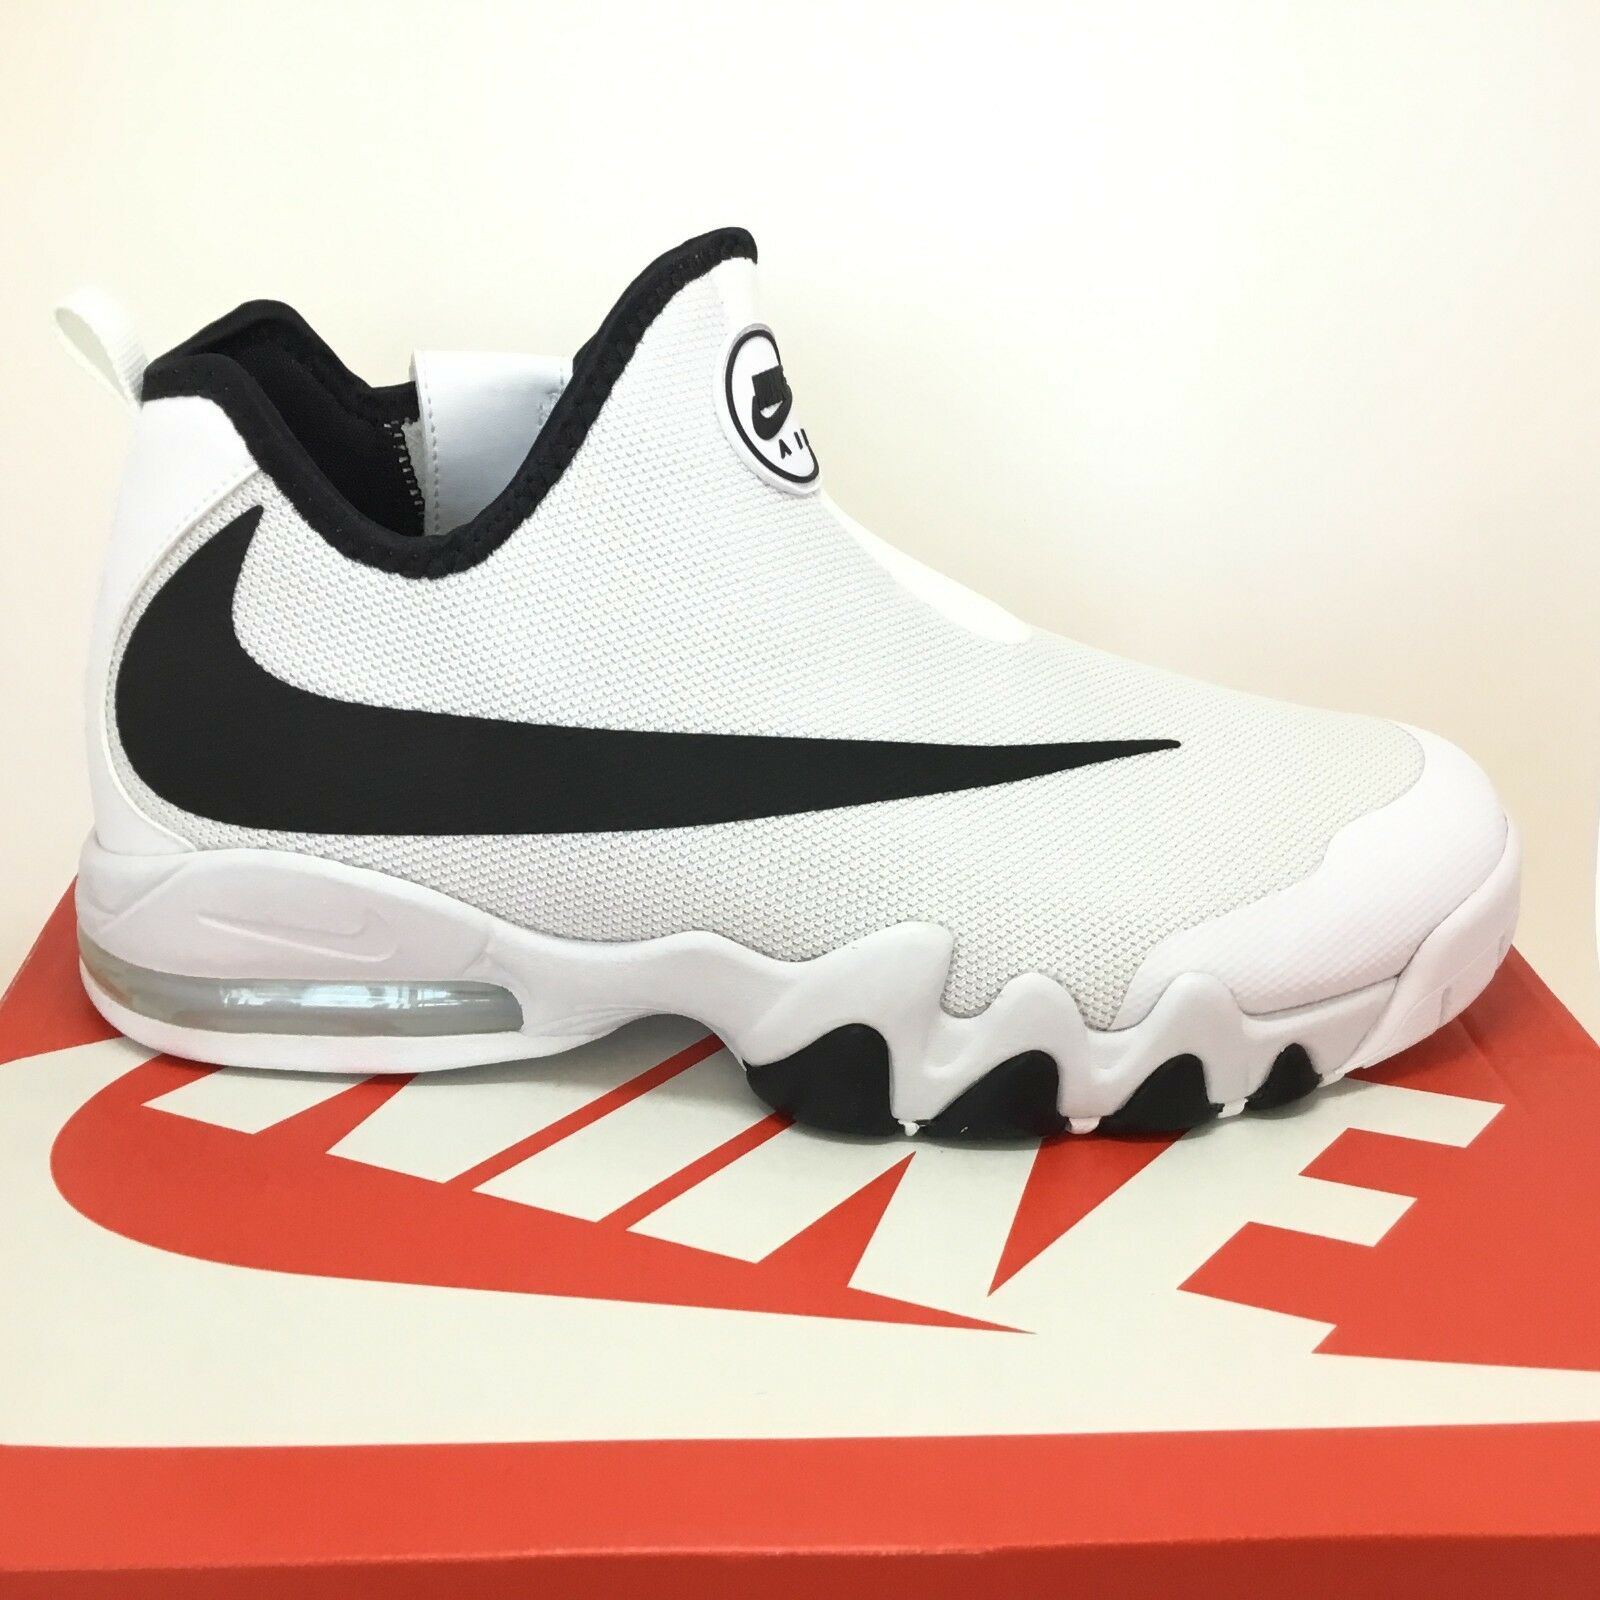 Nike Glove Air Max Big Swoosh Glove Nike 832759-100 Basketball White Black Mens Size 12 06a4d7